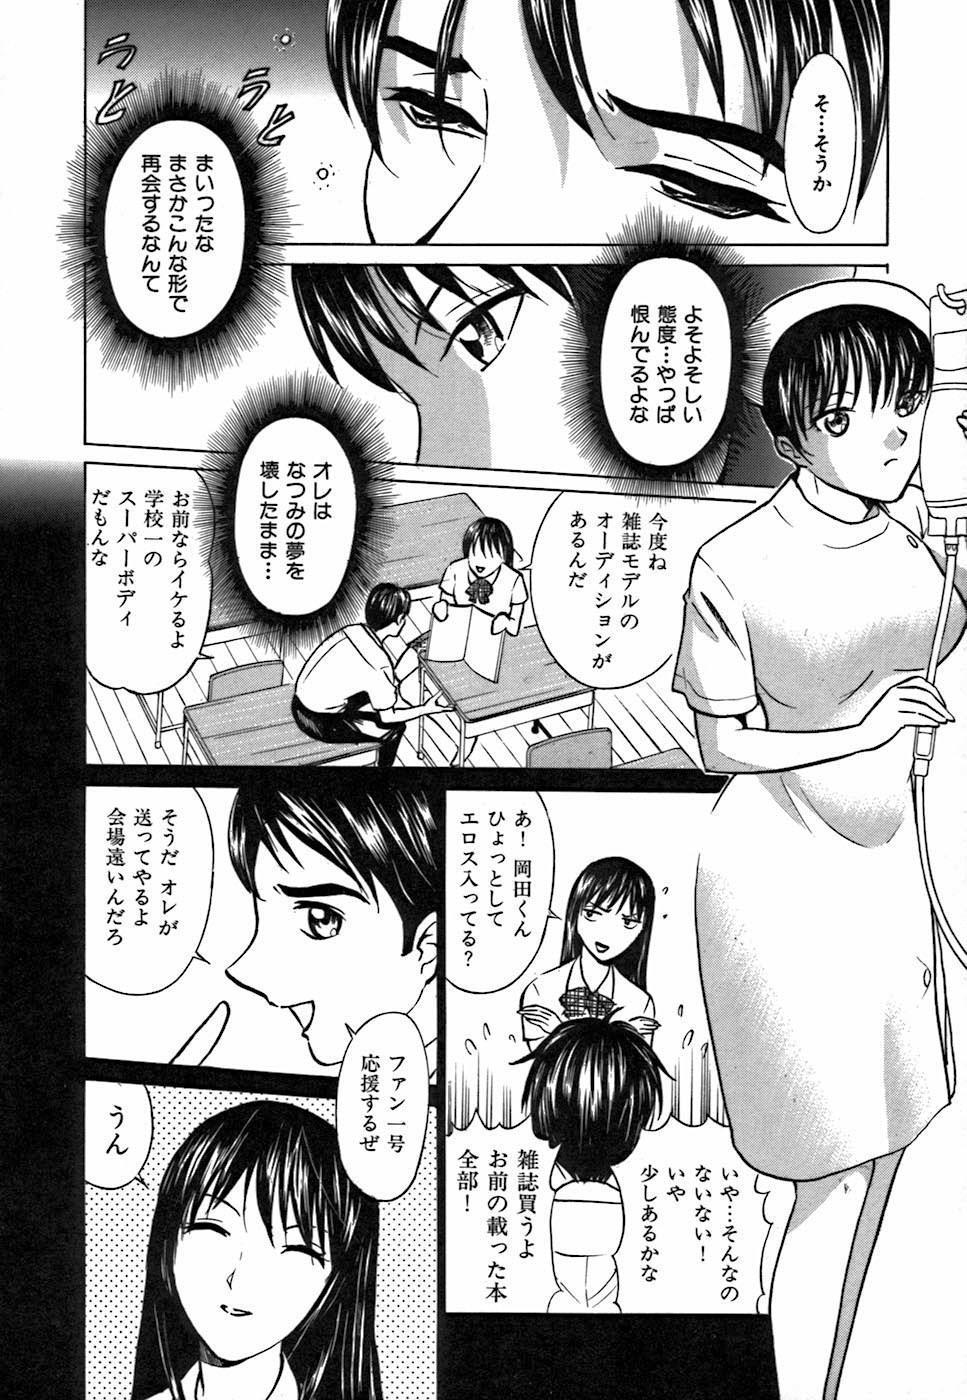 Kimi ga Nozomu Katachi | Appearance for which you hope 29